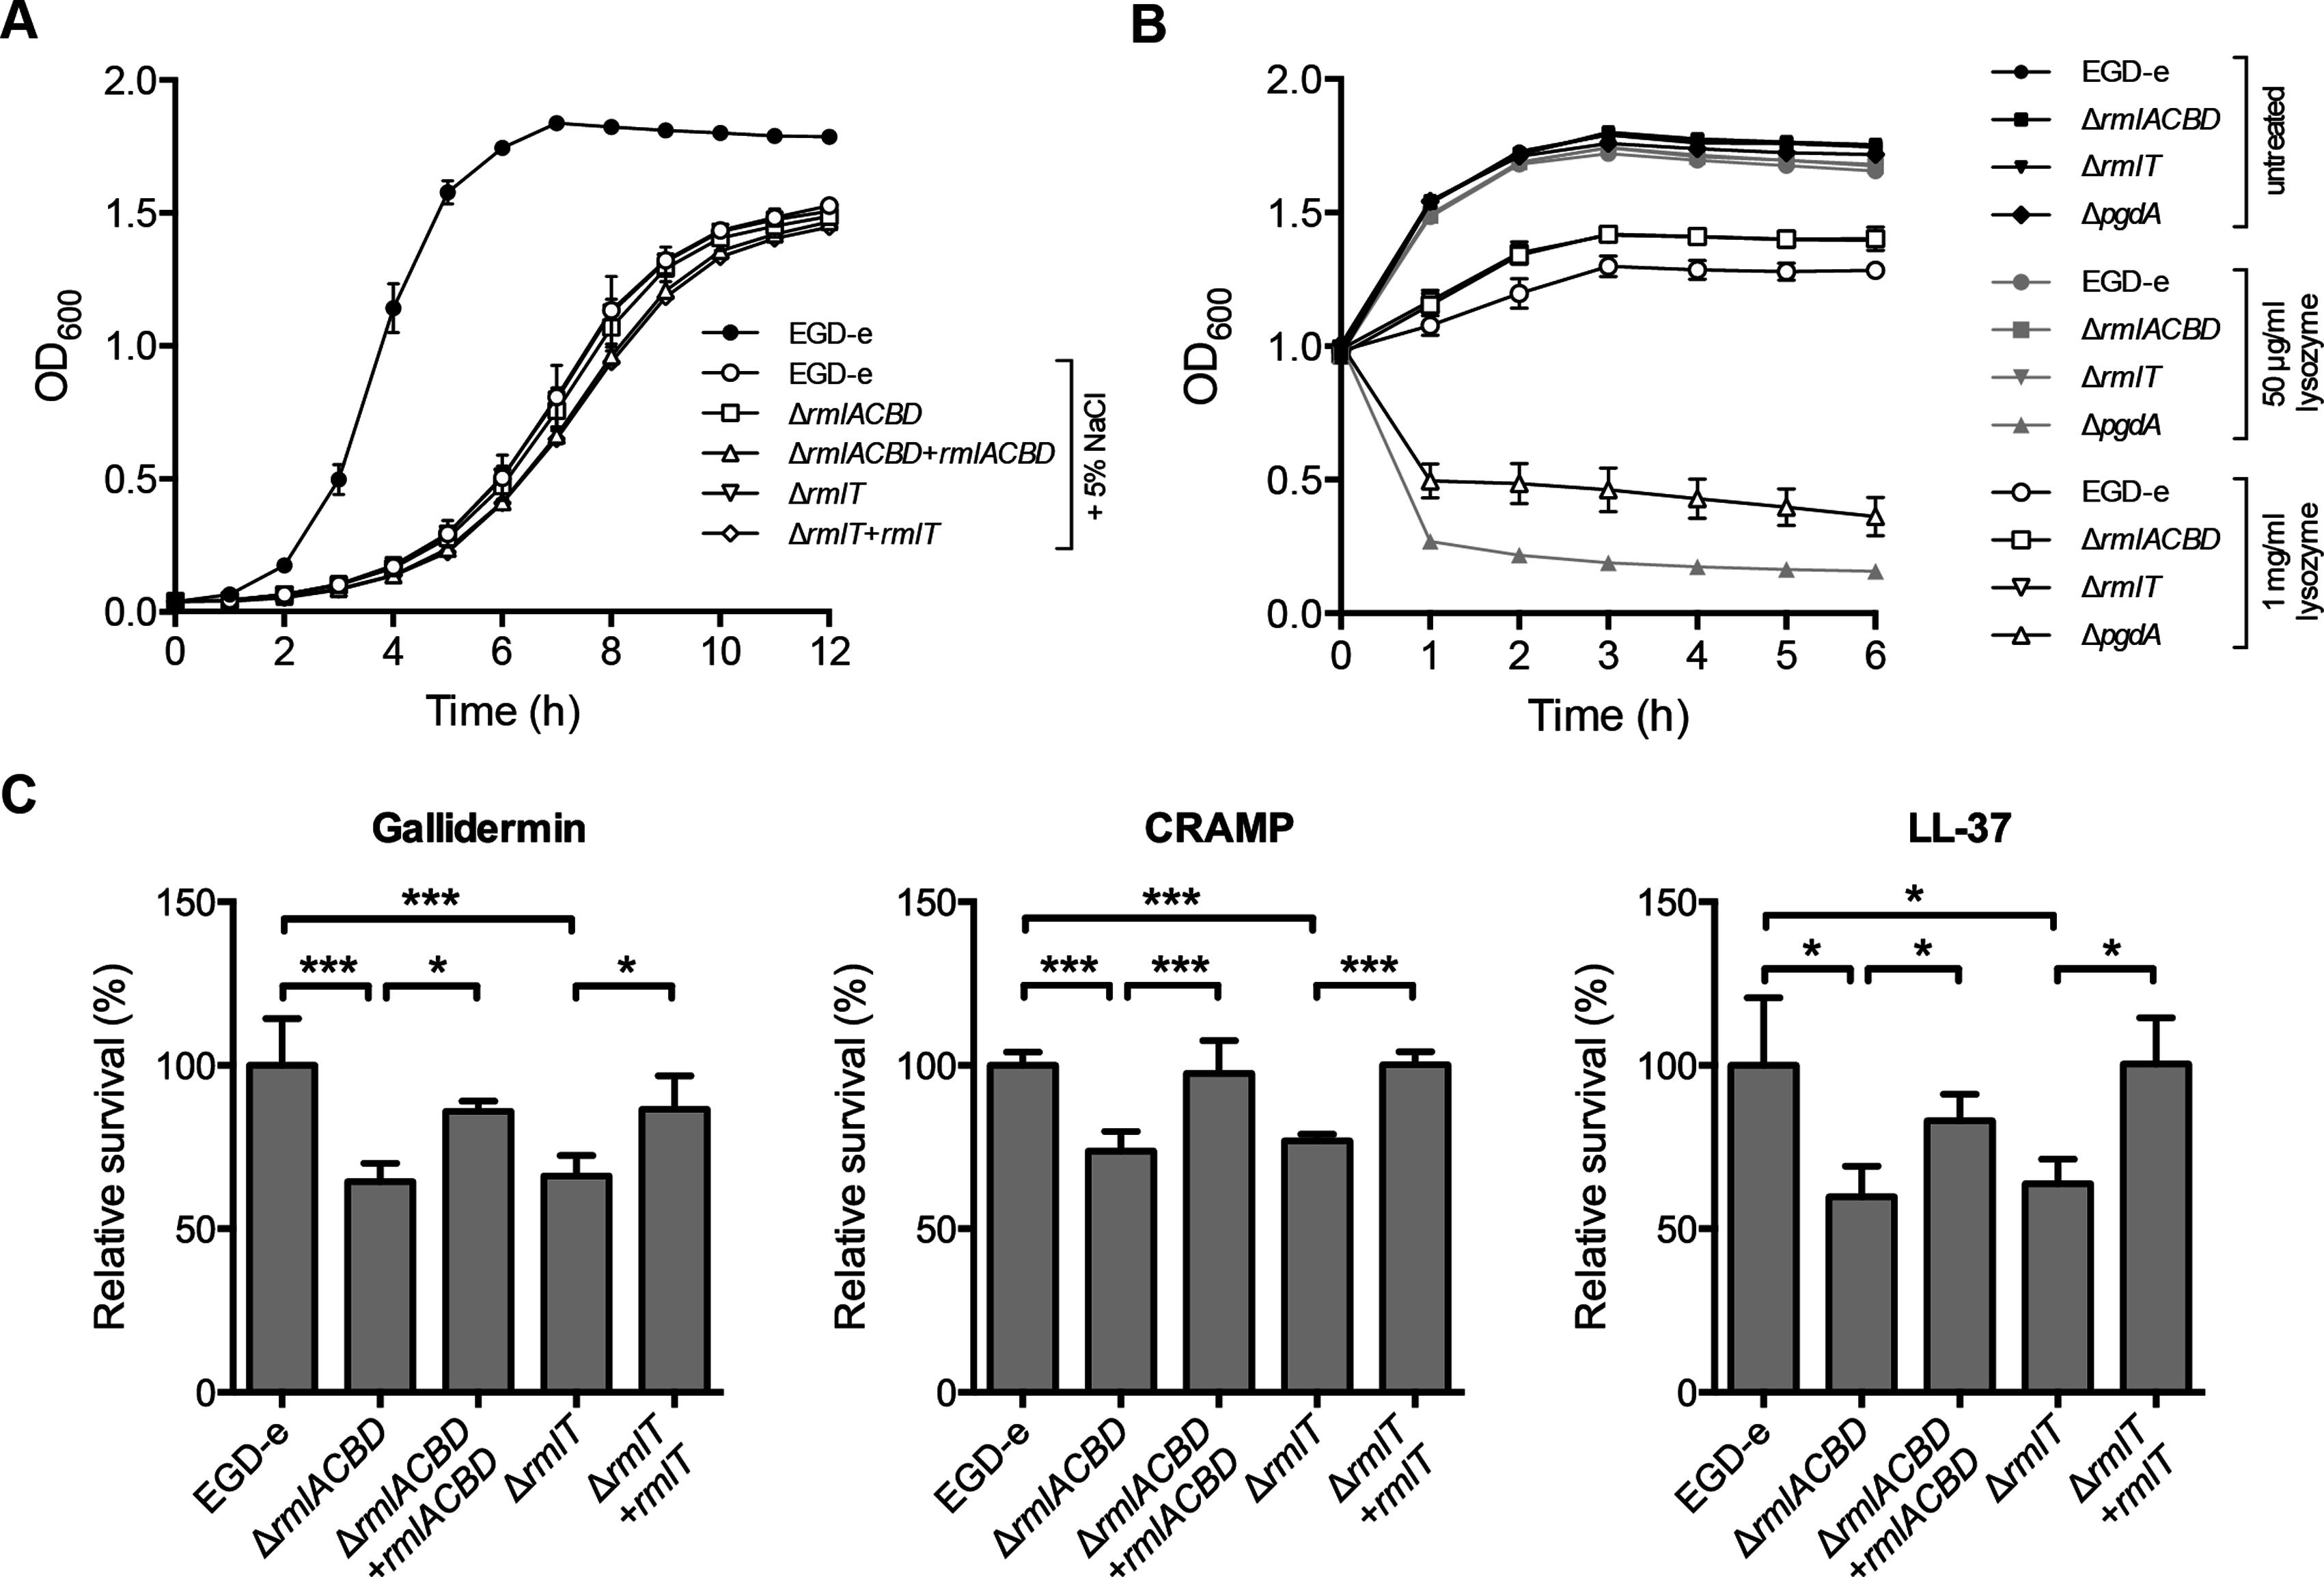 WTA l-rhamnosylation promotes <i>Lm</i> resistance against AMPs.